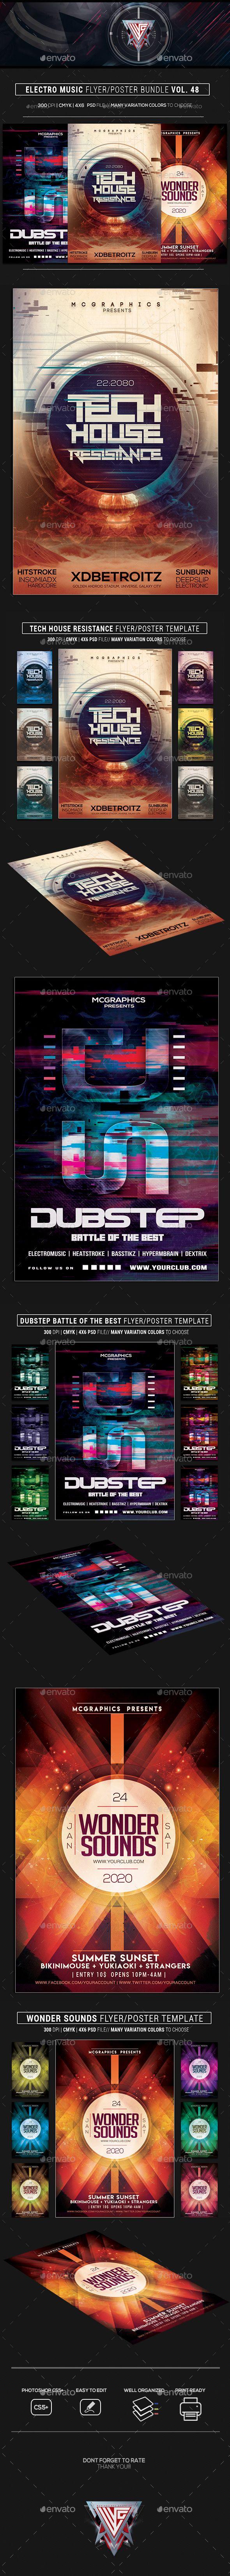 #Electro Music #Flyer Bundle Vol 48 - Flyers Print Templates